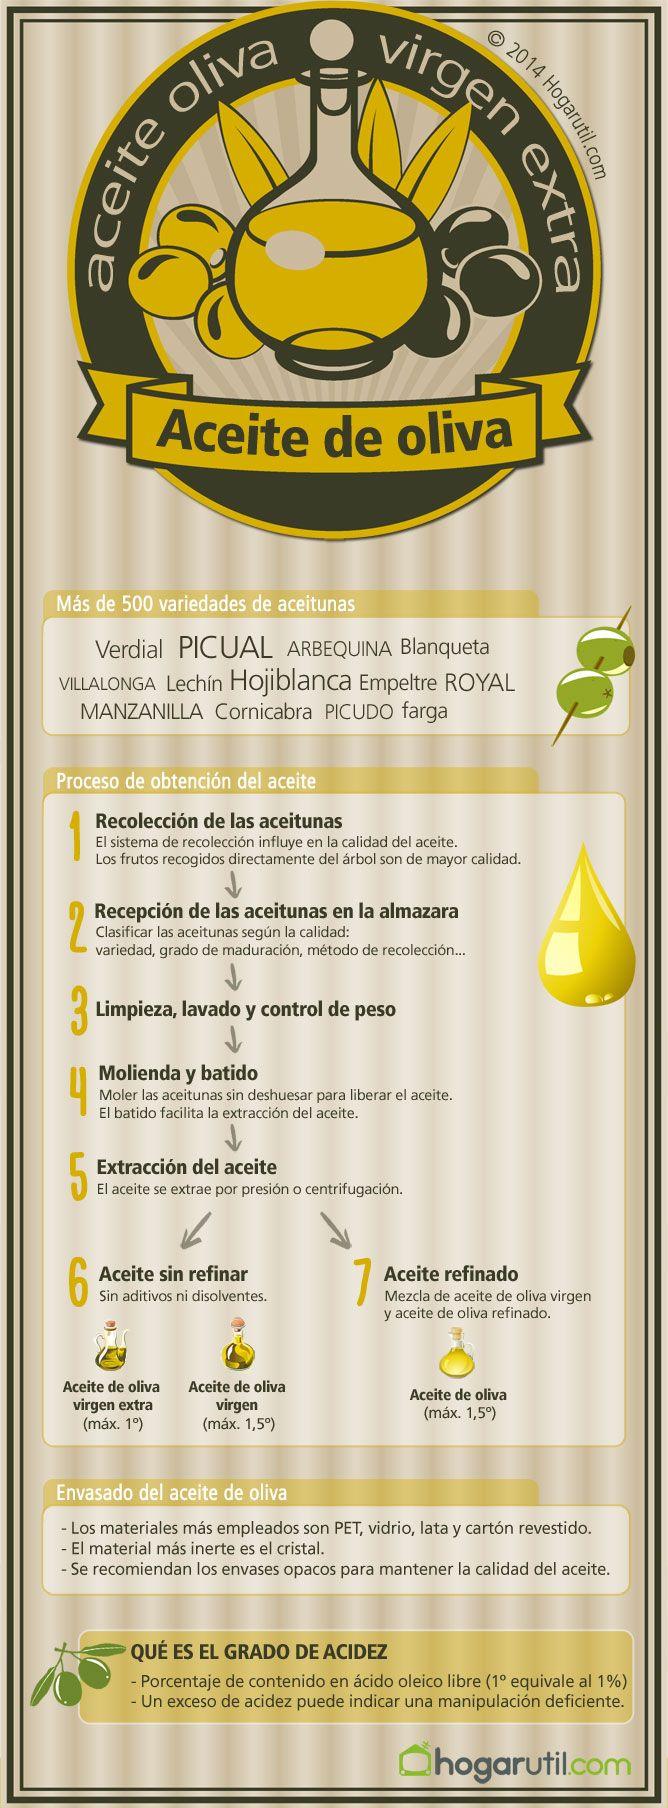 Aceite de oliva (Infografía)